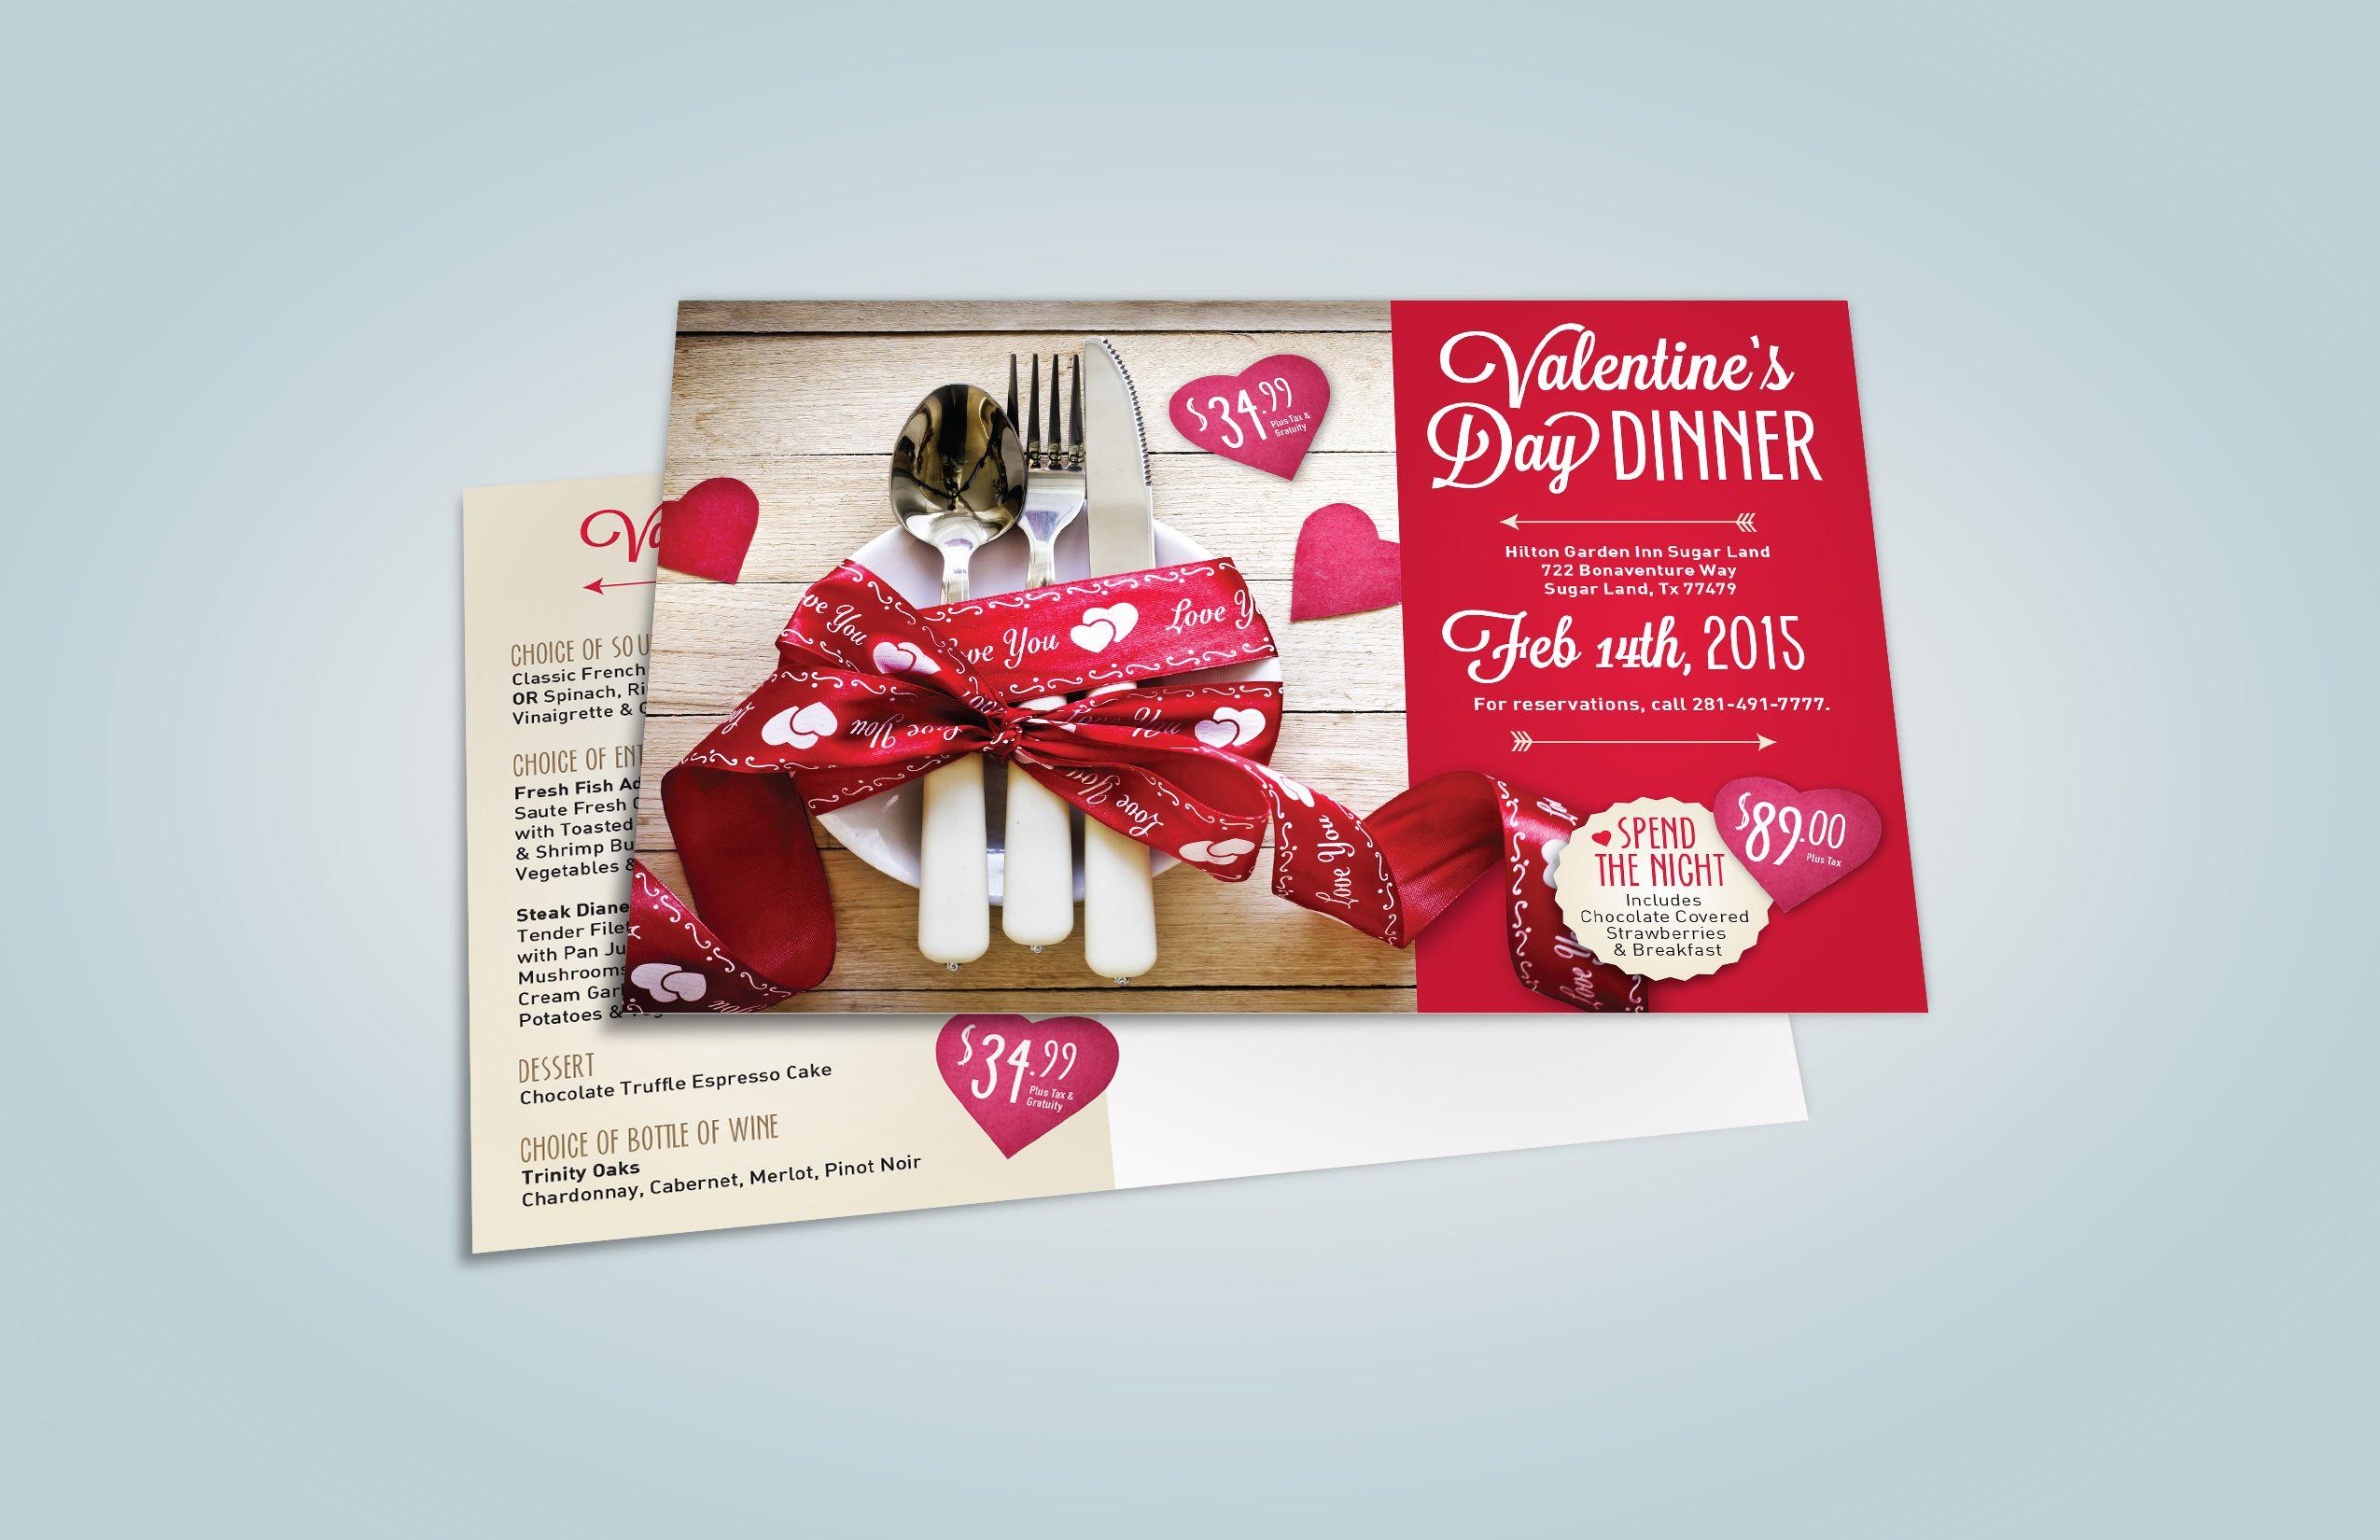 Hilton Garden Inn Valentine Postcard Designed & Printed by AlphaGraphics Sugar Land